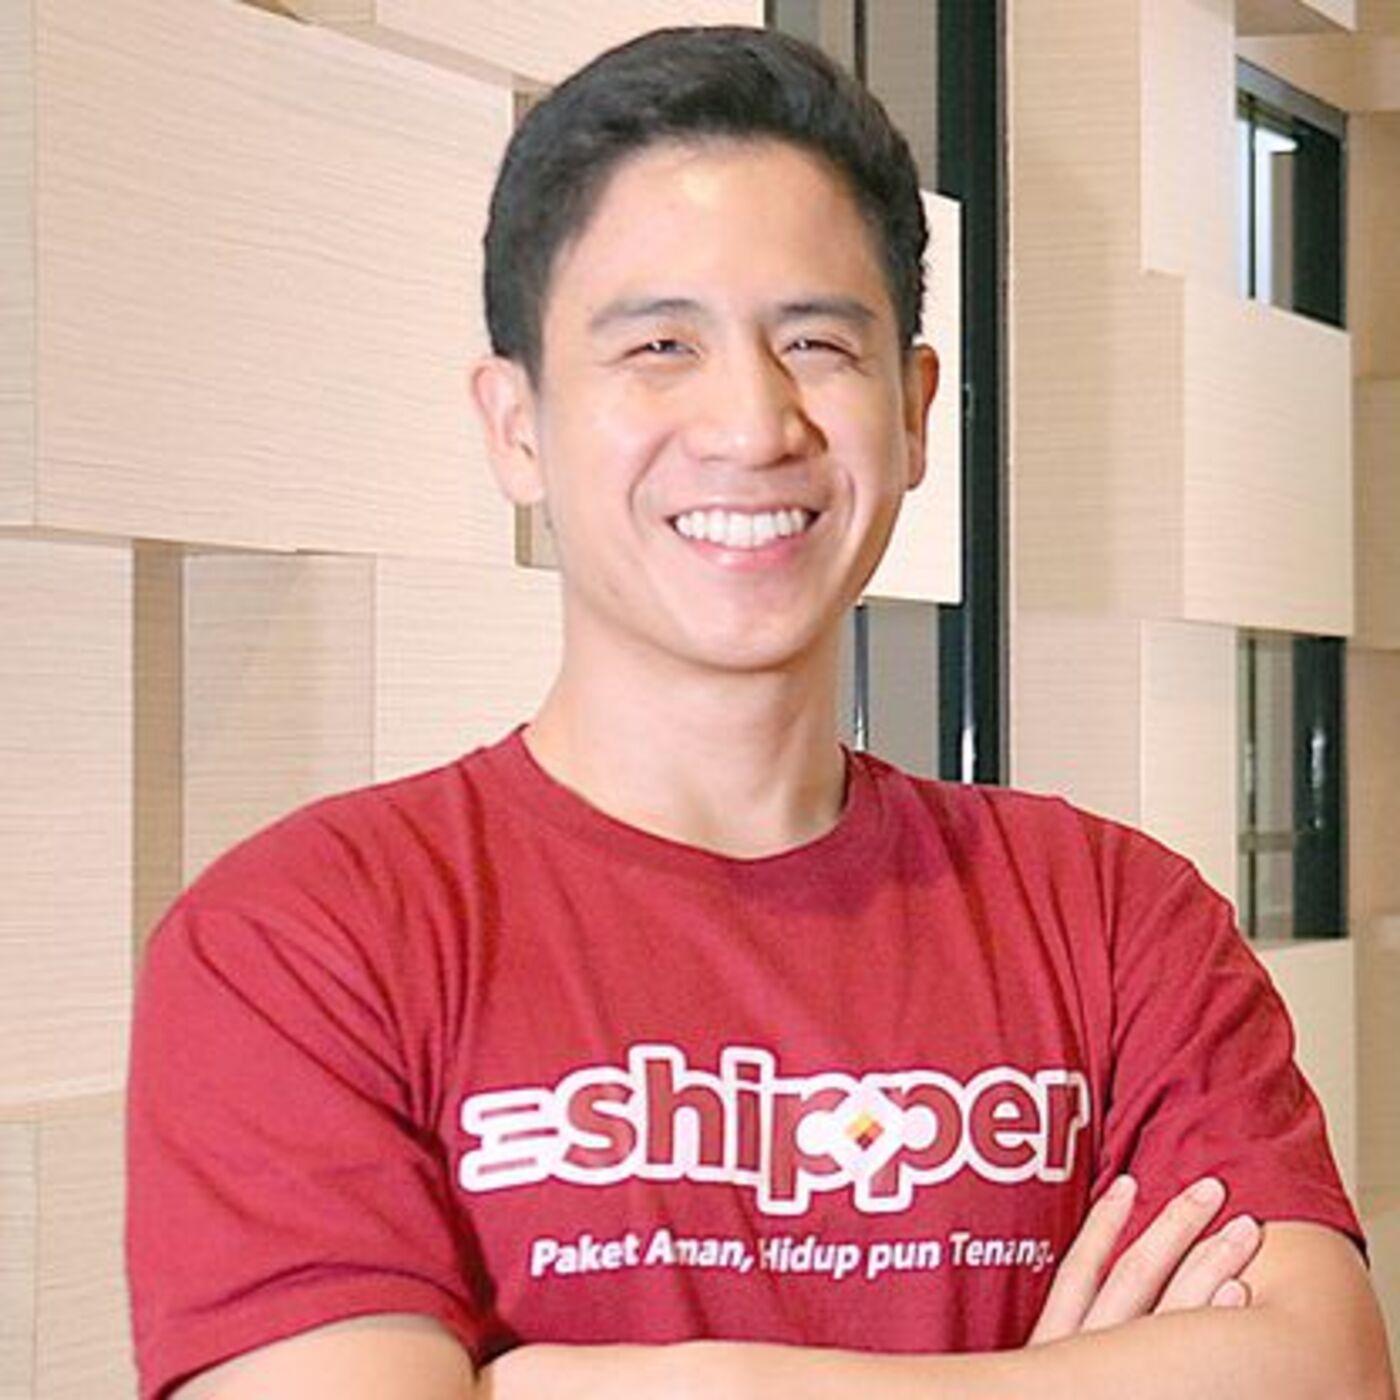 Phil Opamuratawongse Co-Founder of Shipper